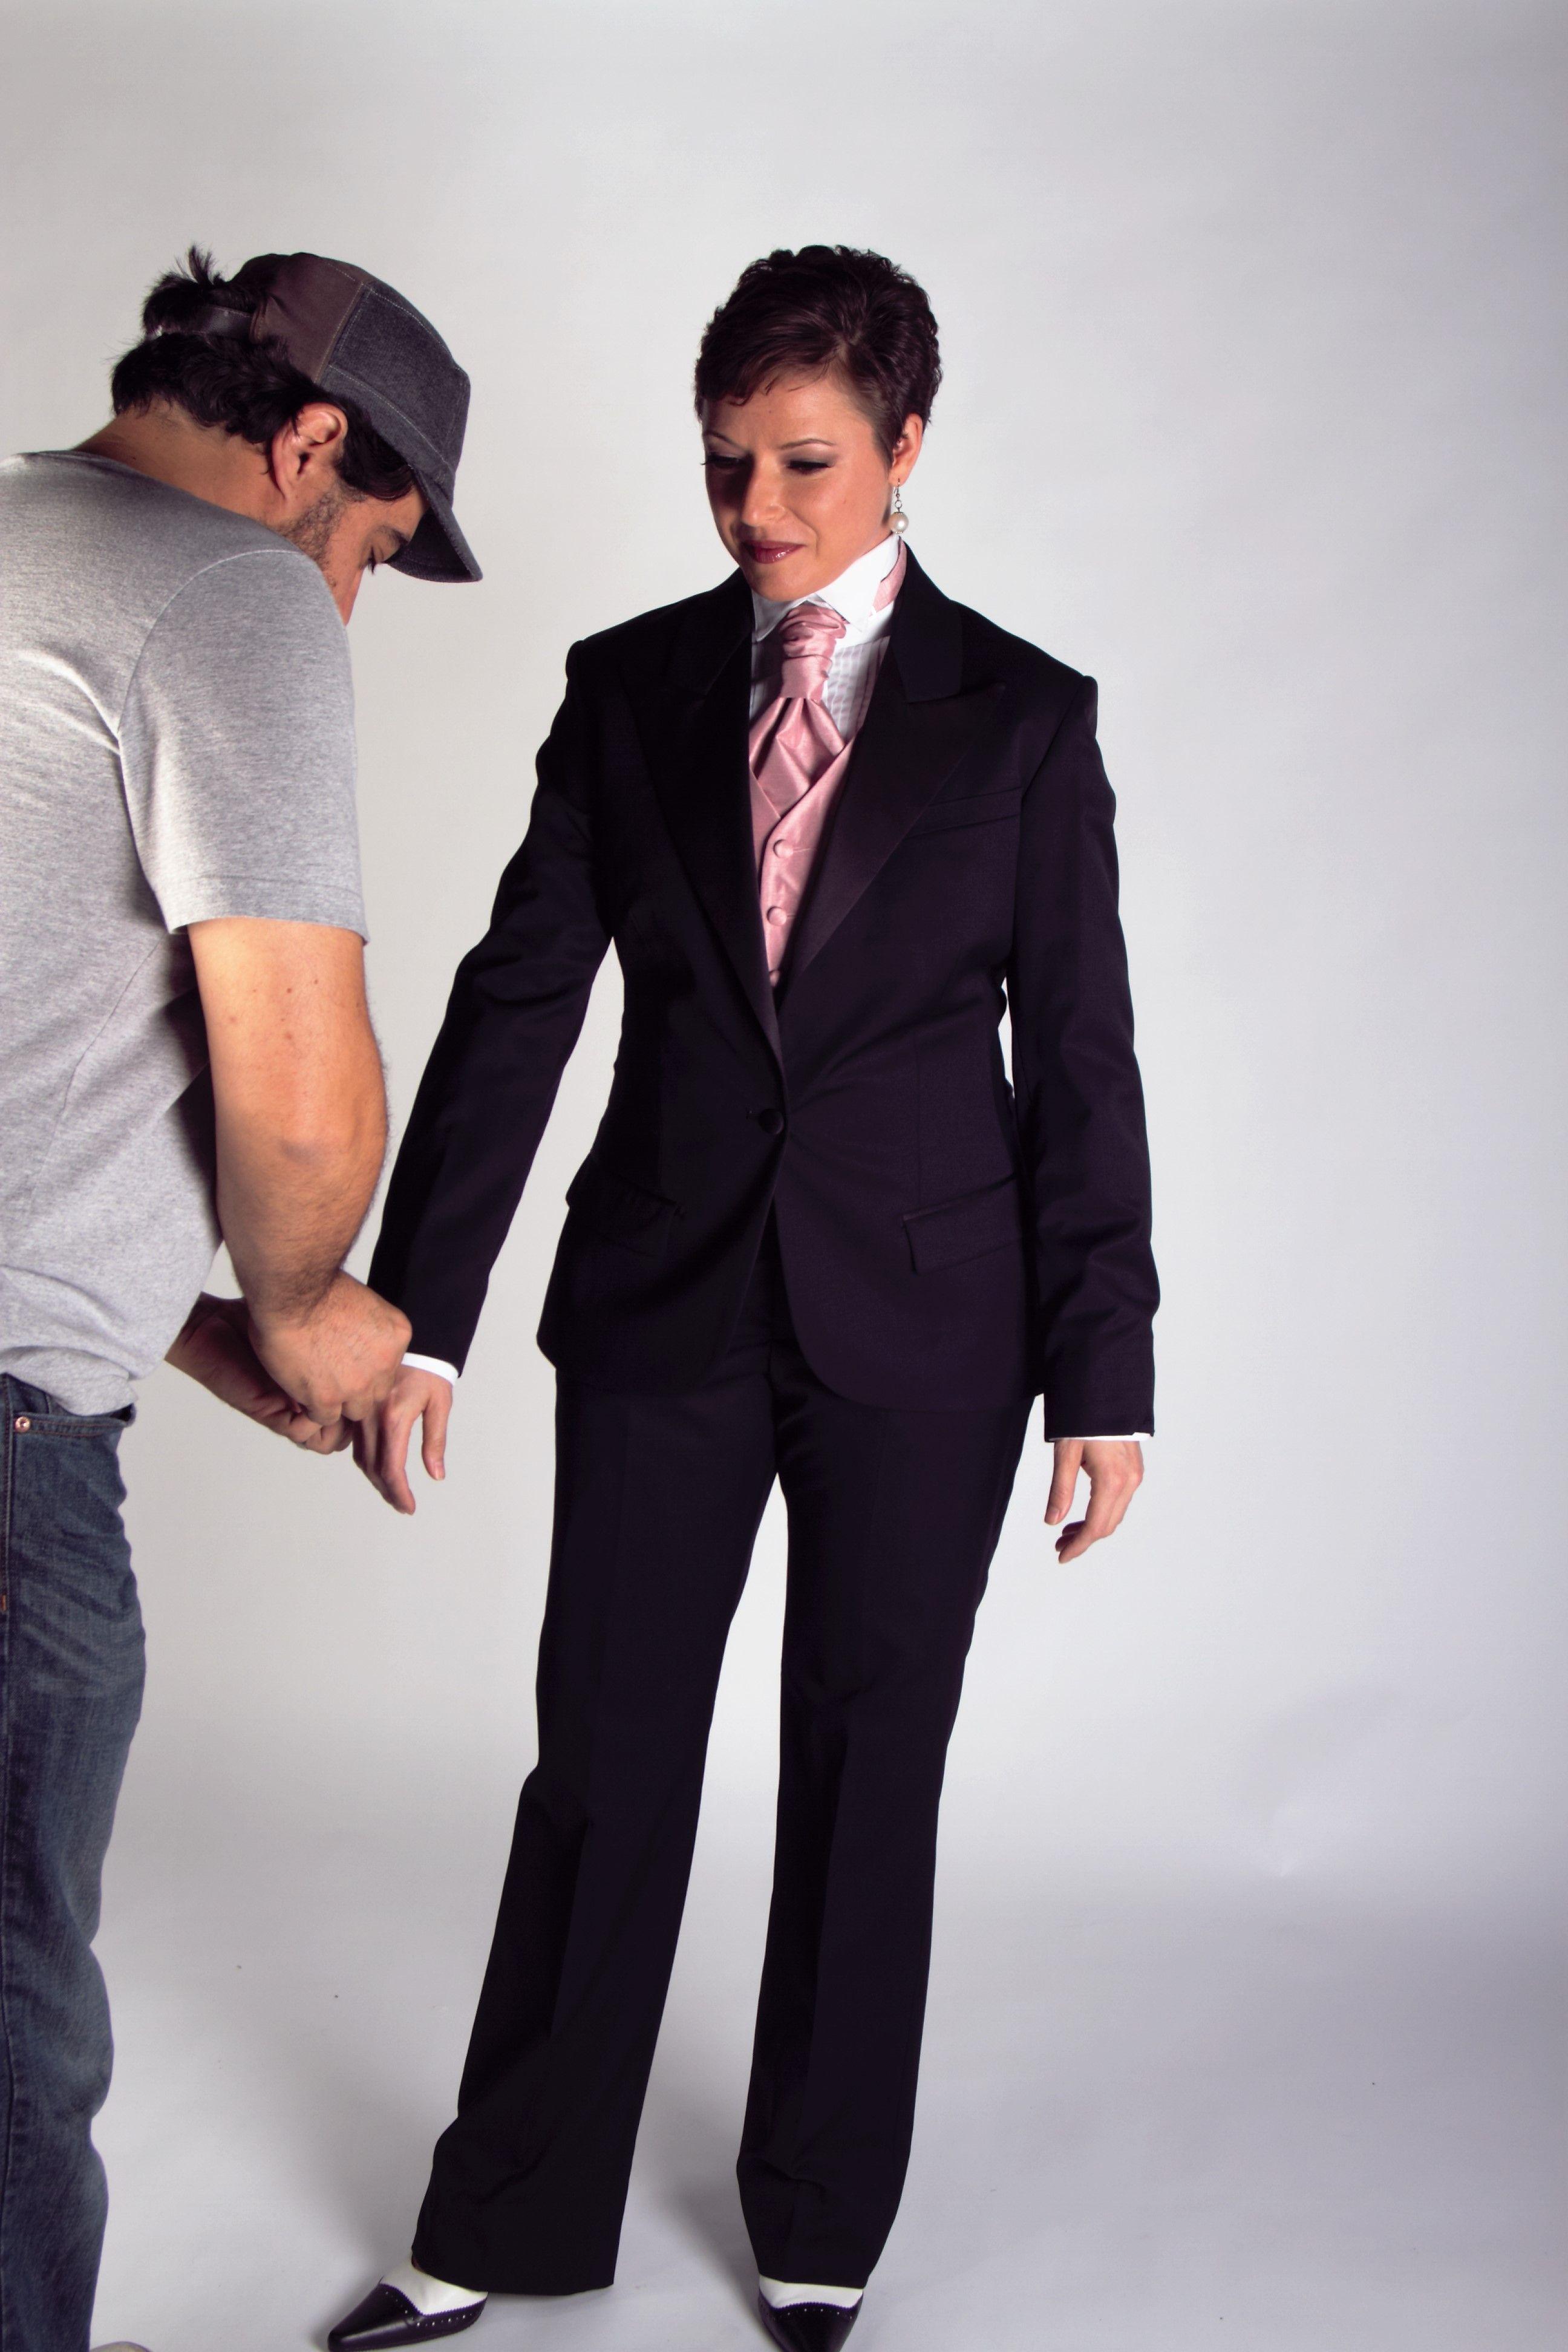 Beautiful Tuxedo for women | Wedding suits | Pinterest | Women ...